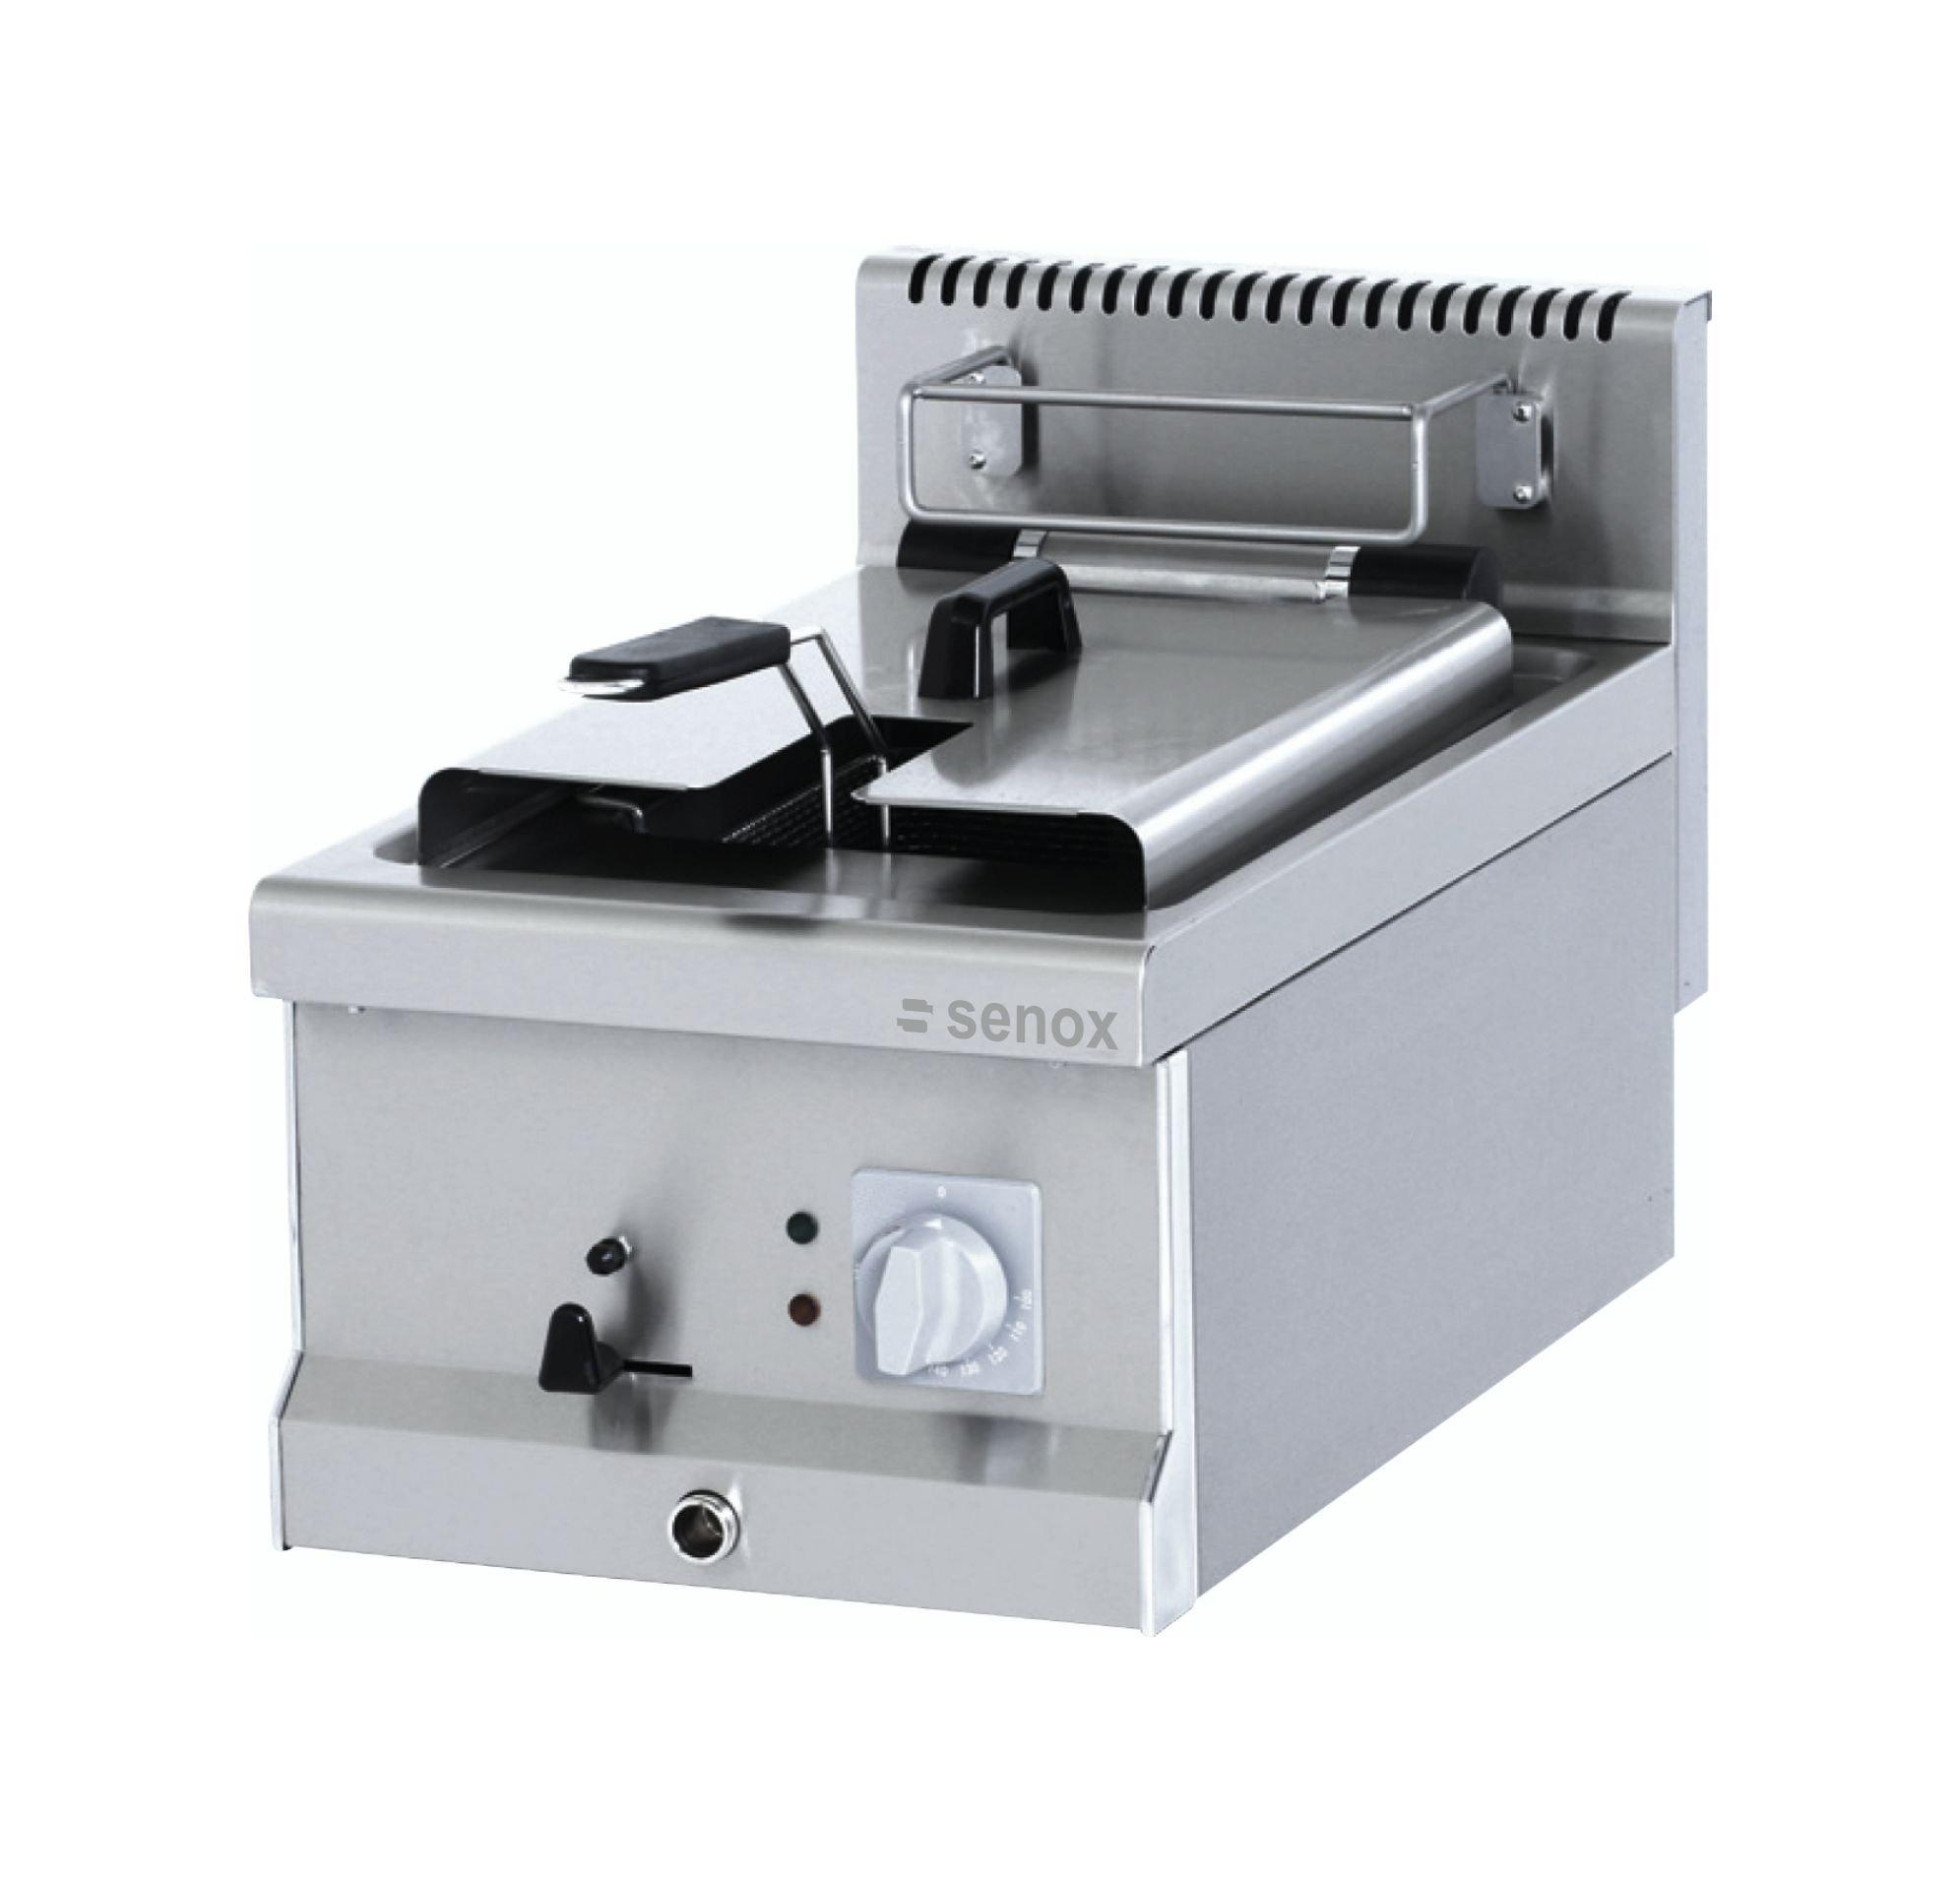 senox-aef-470-elektrikli-fritoz